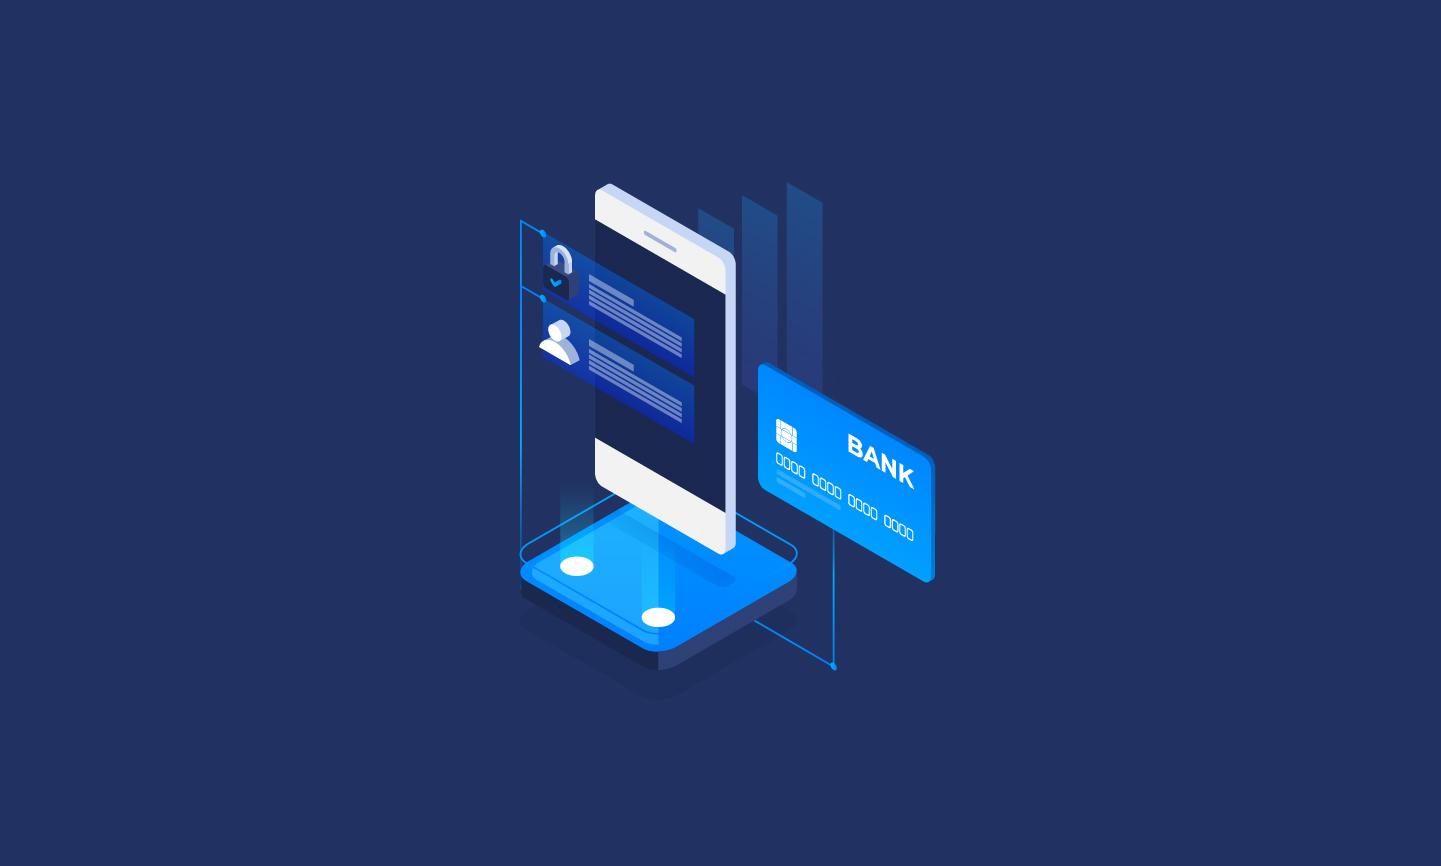 Cuentas digitales